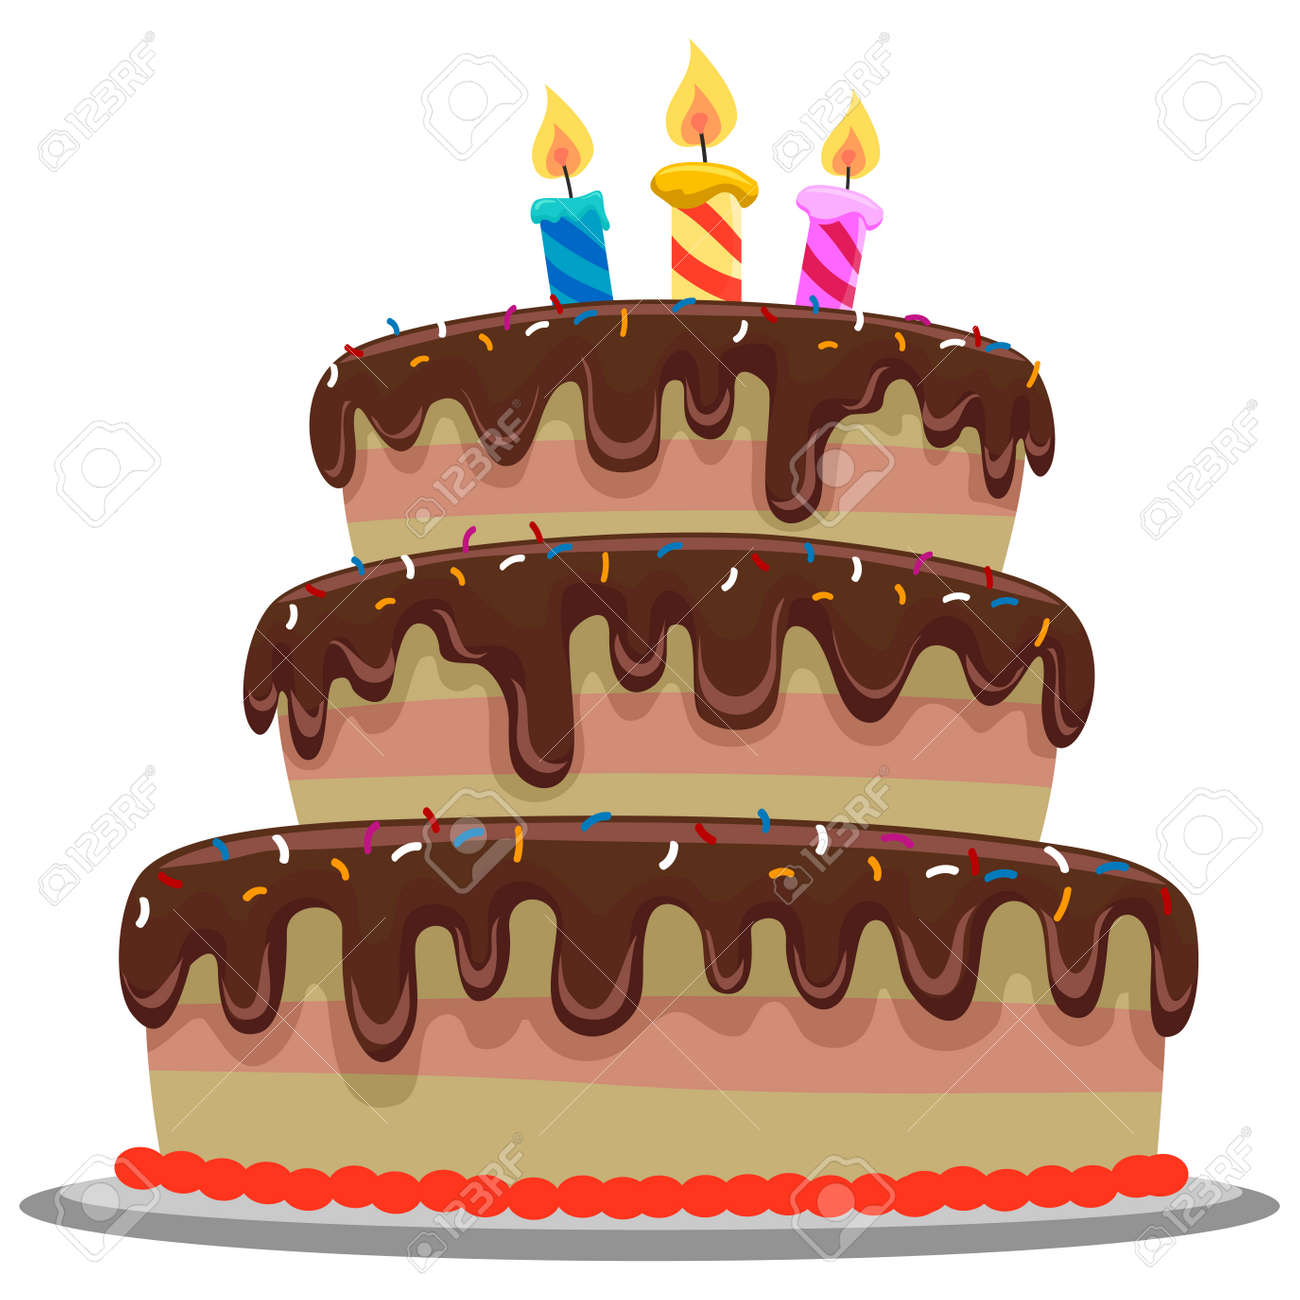 Birthday Cake Stock Photos Royalty Free Birthday Cake Images